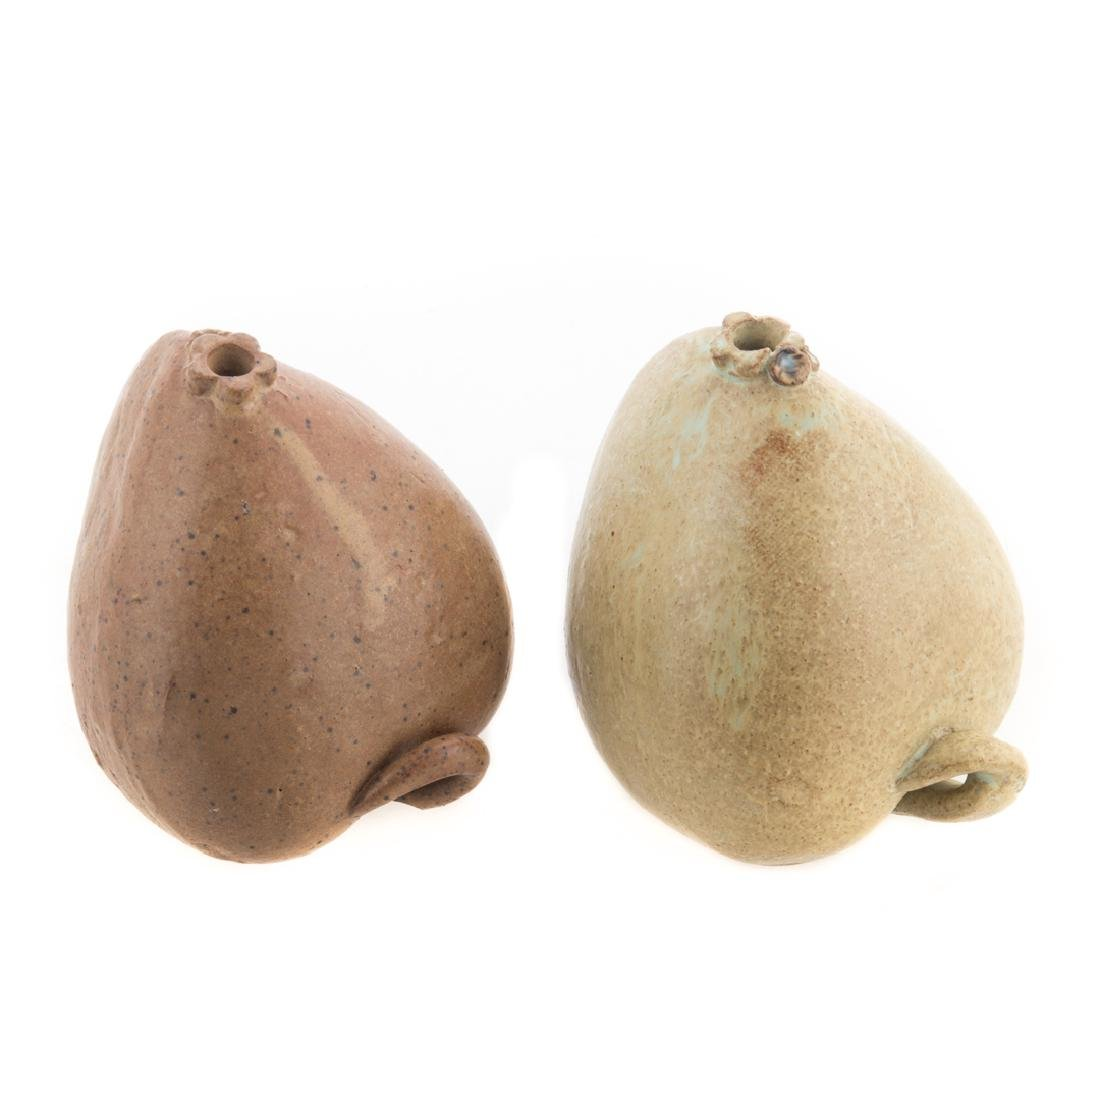 Slaithong Schmutzhart. Two ceramic fruits